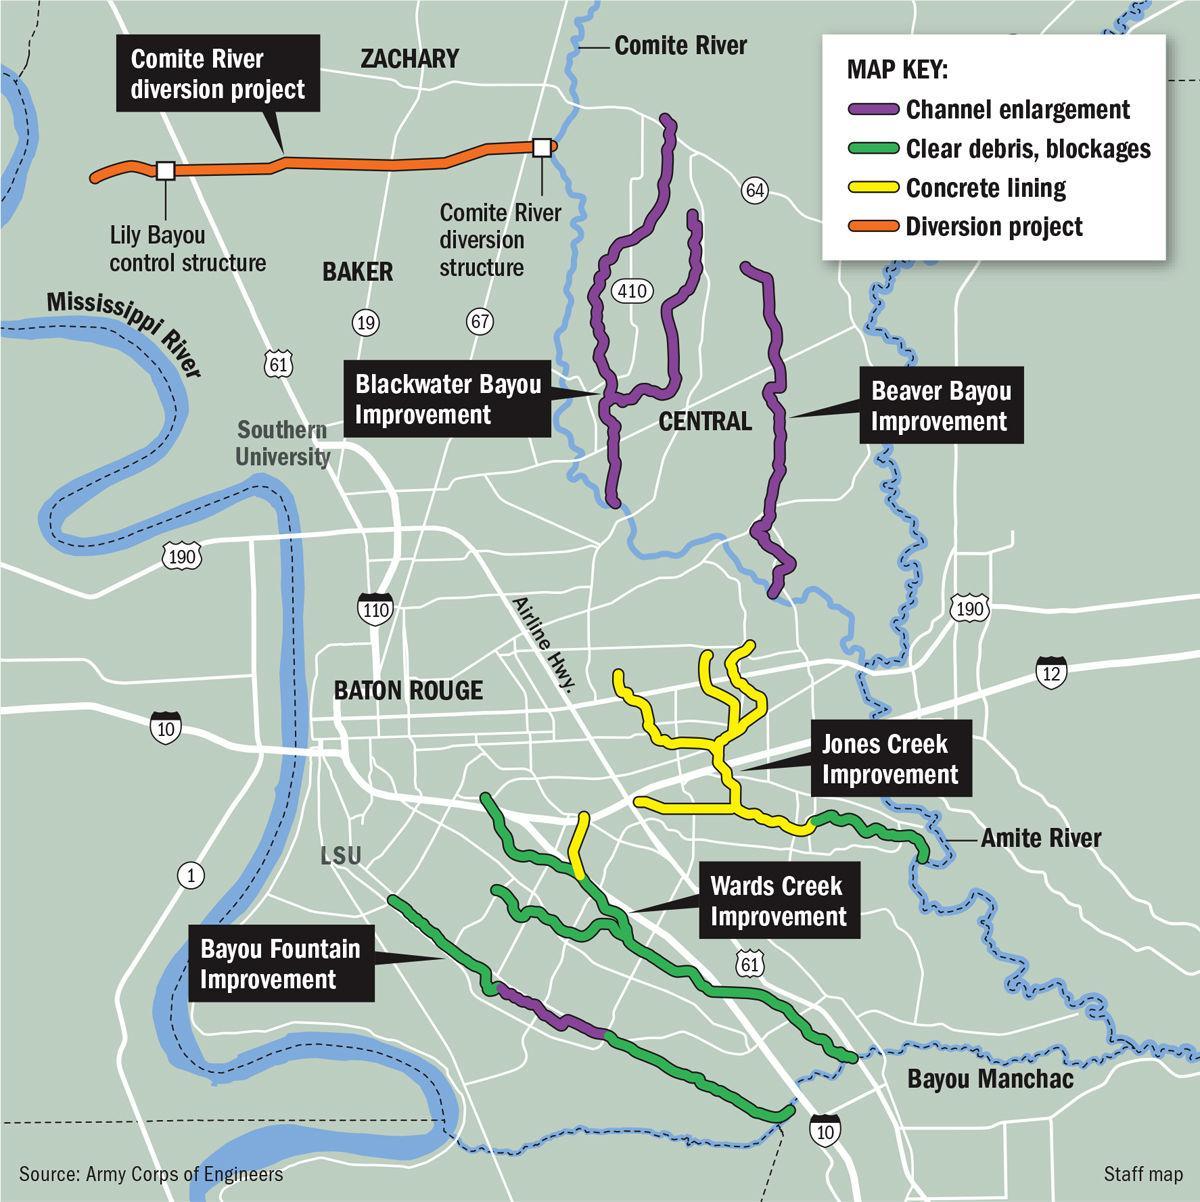 081919 BR rivers waterways map